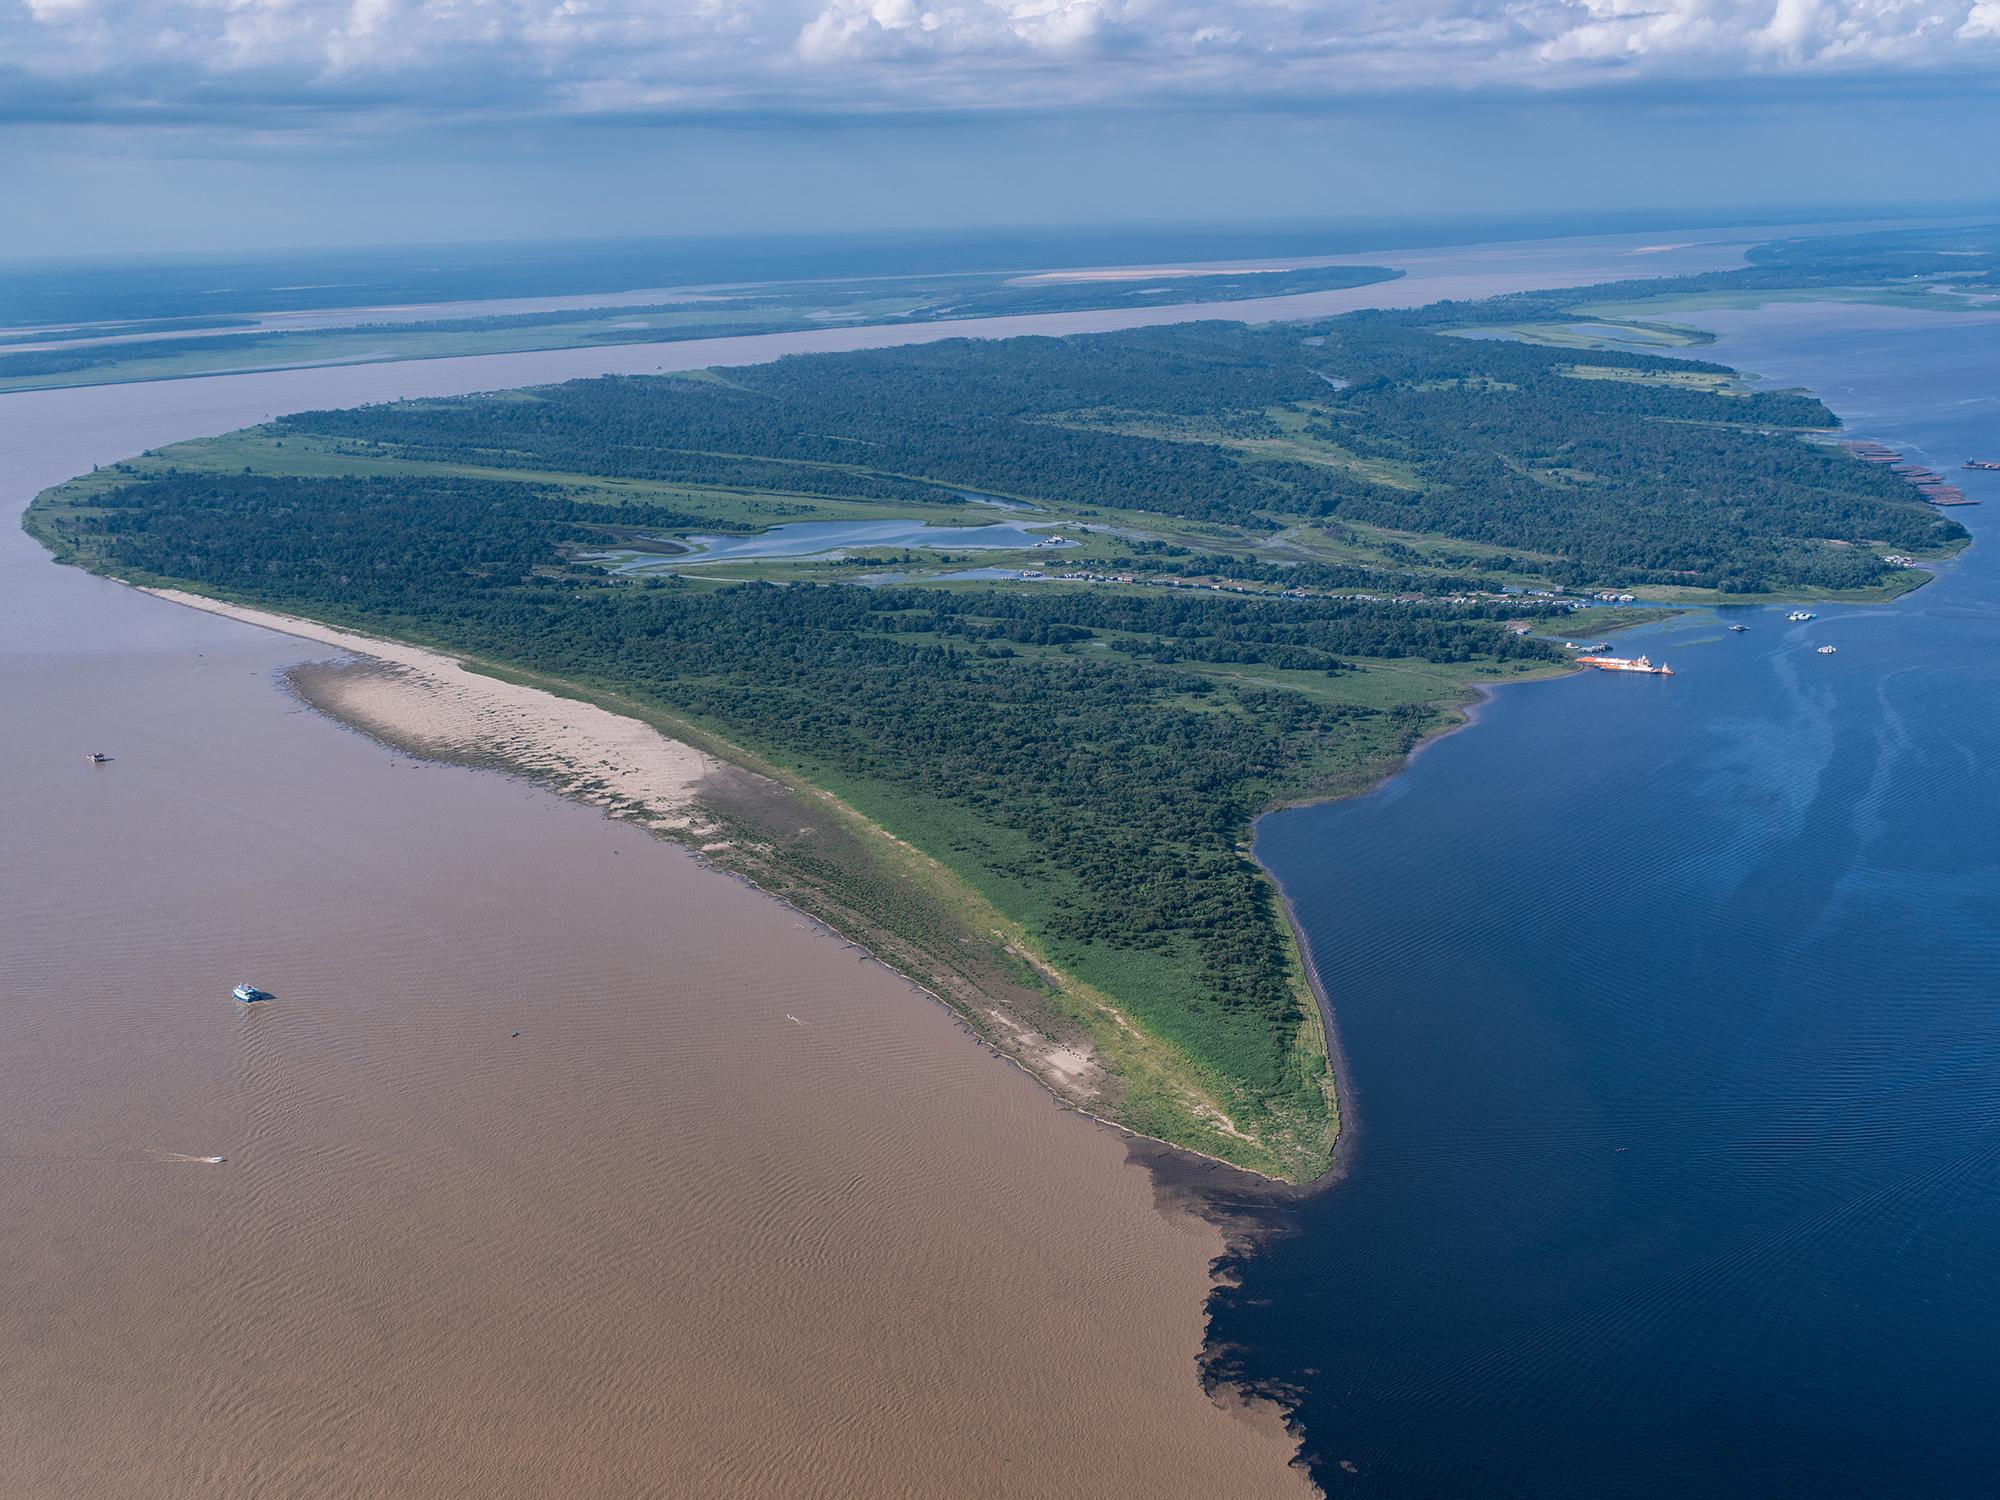 Where the Amazon River meets the Rio Negro.